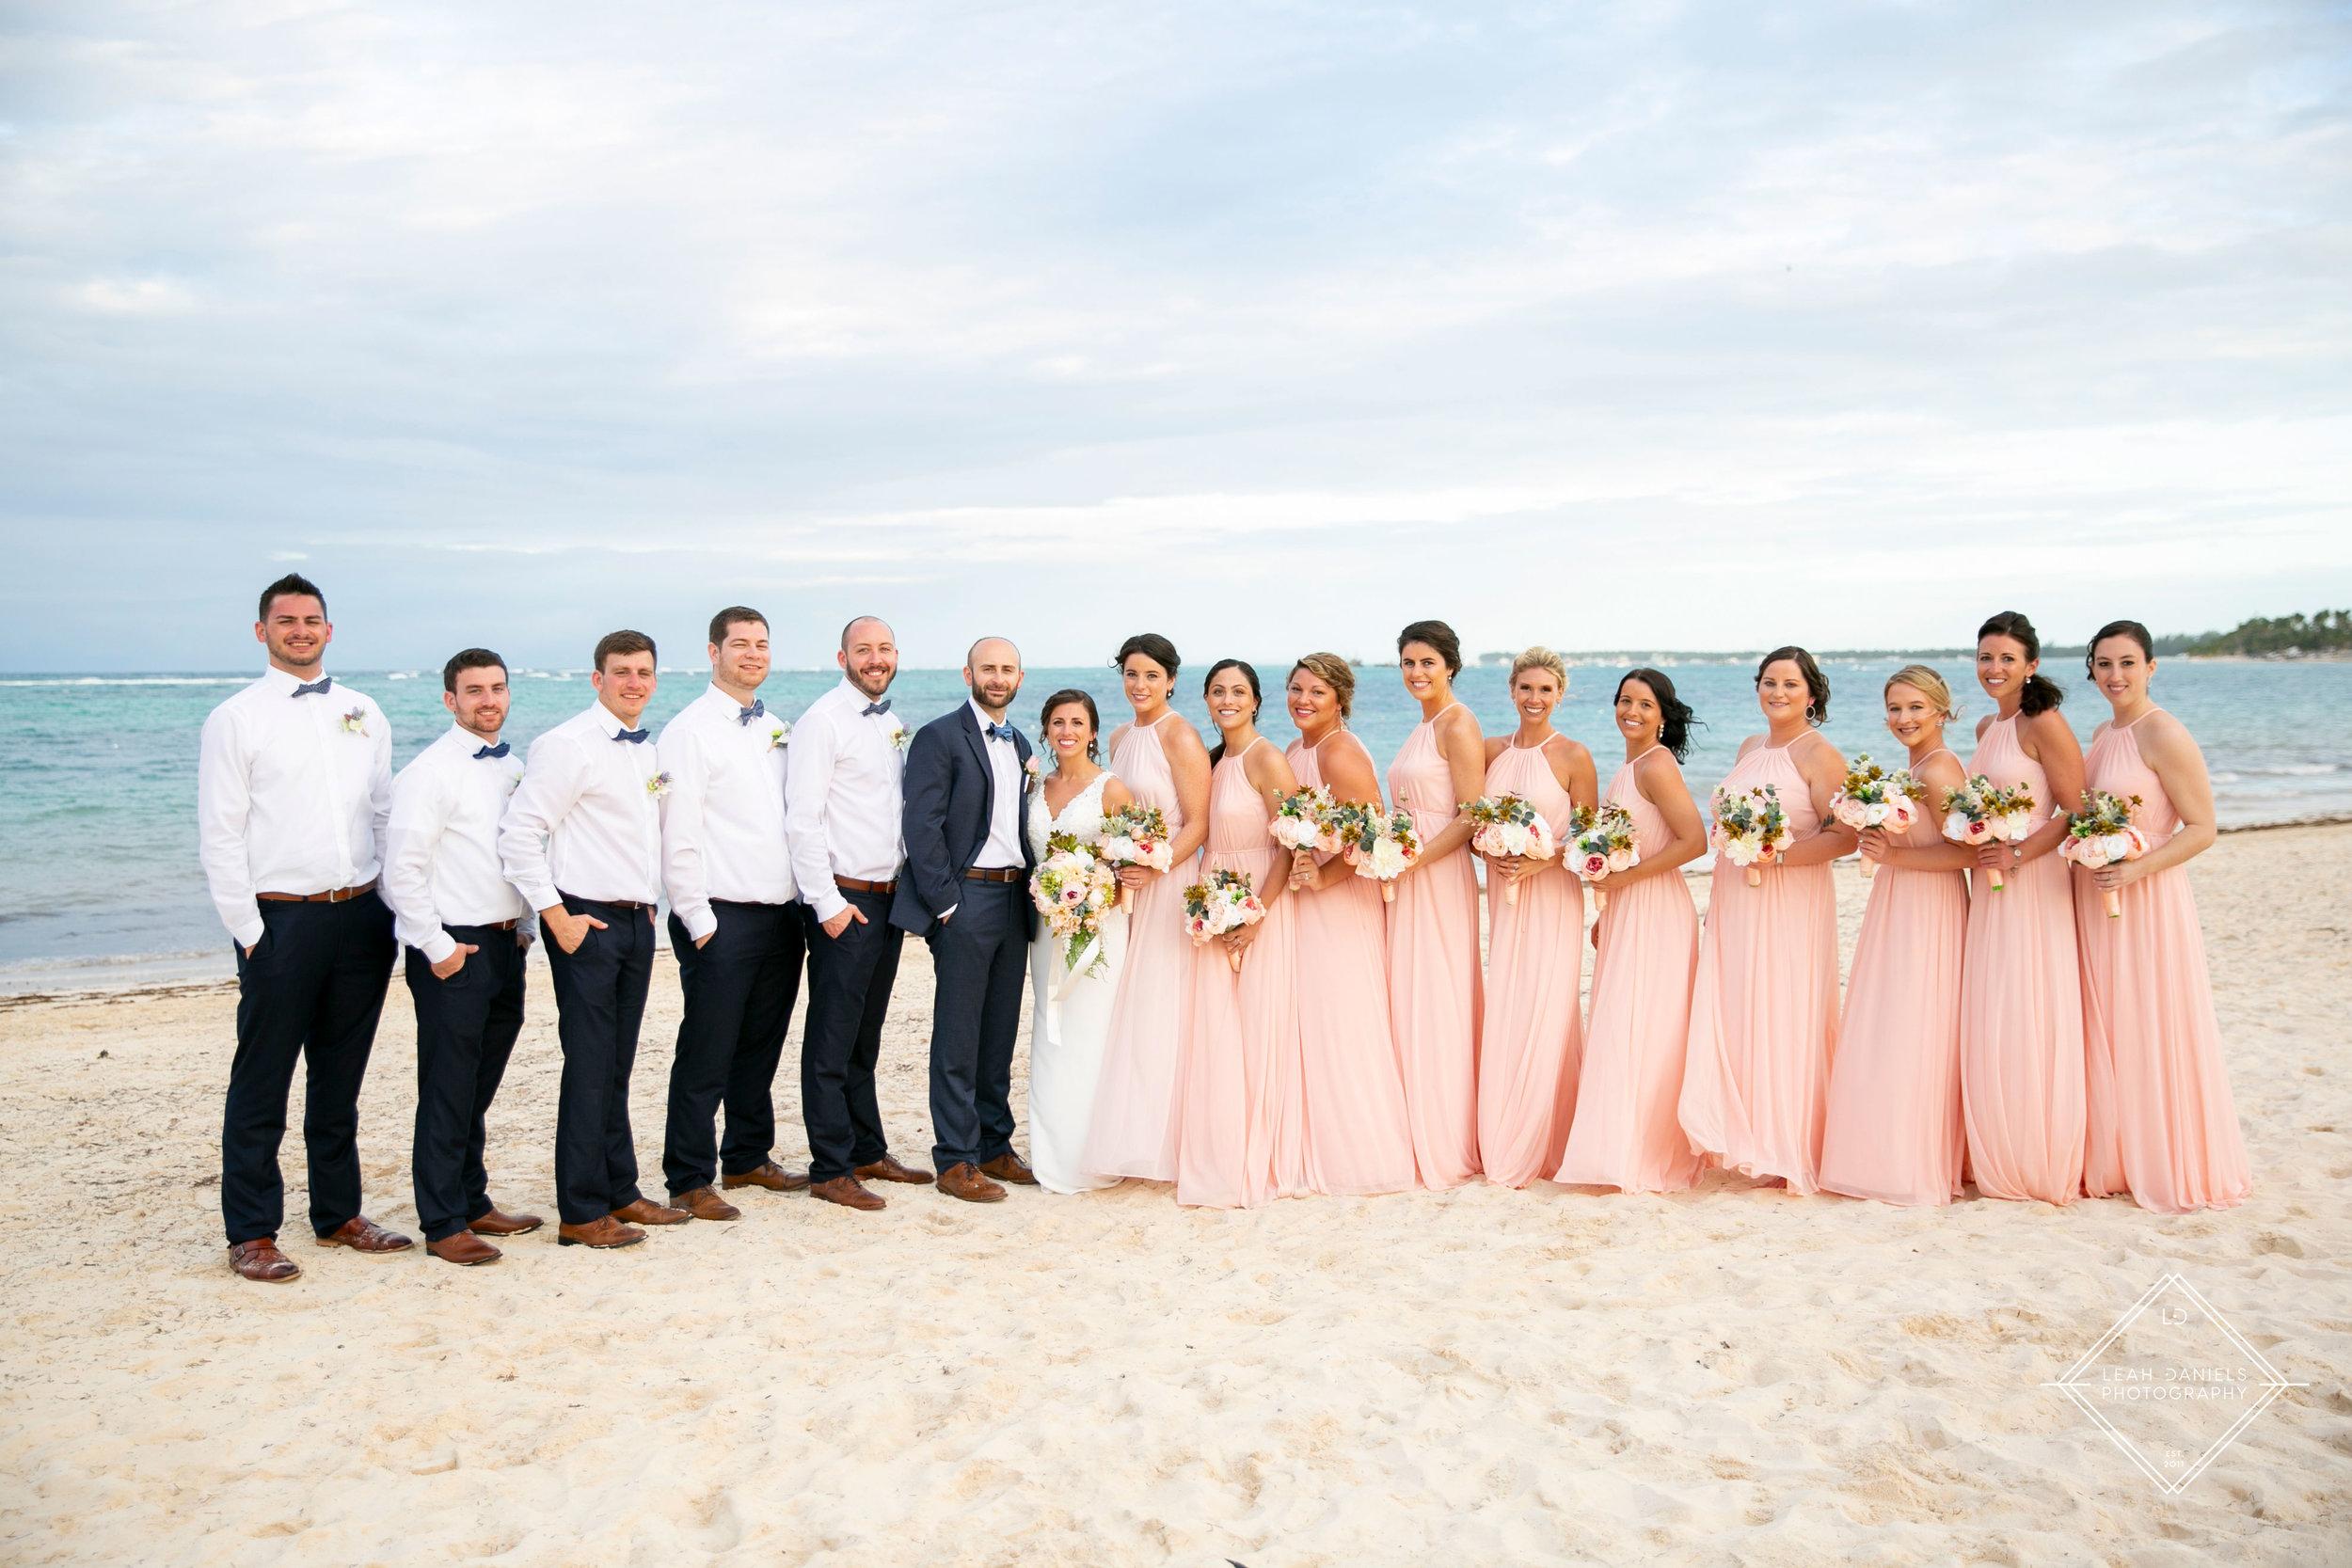 NOW Larimar Destination Wedding; The Bridal party